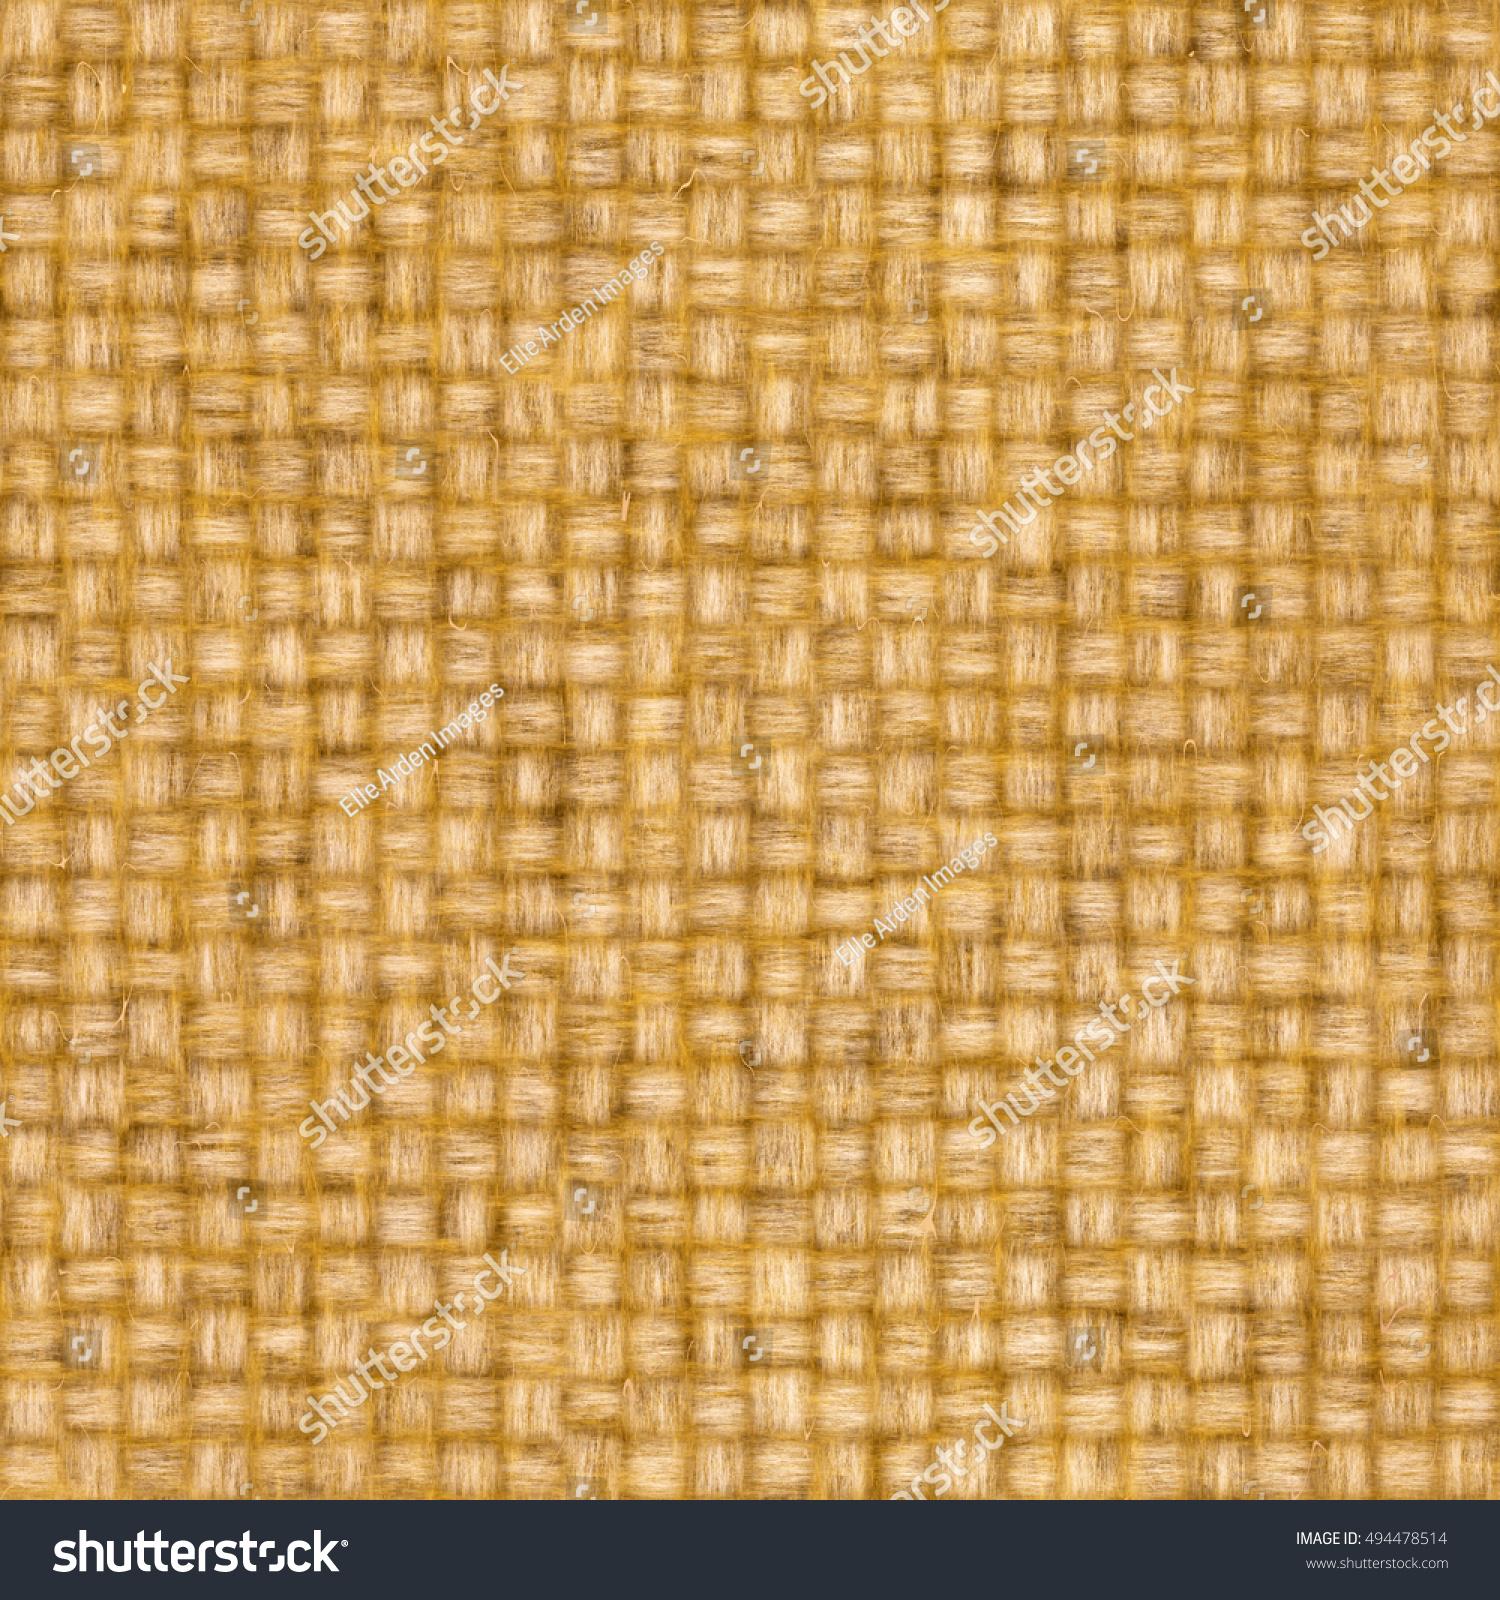 3d Rendering Seamless Weave Texture Golden Stock Illustration ...